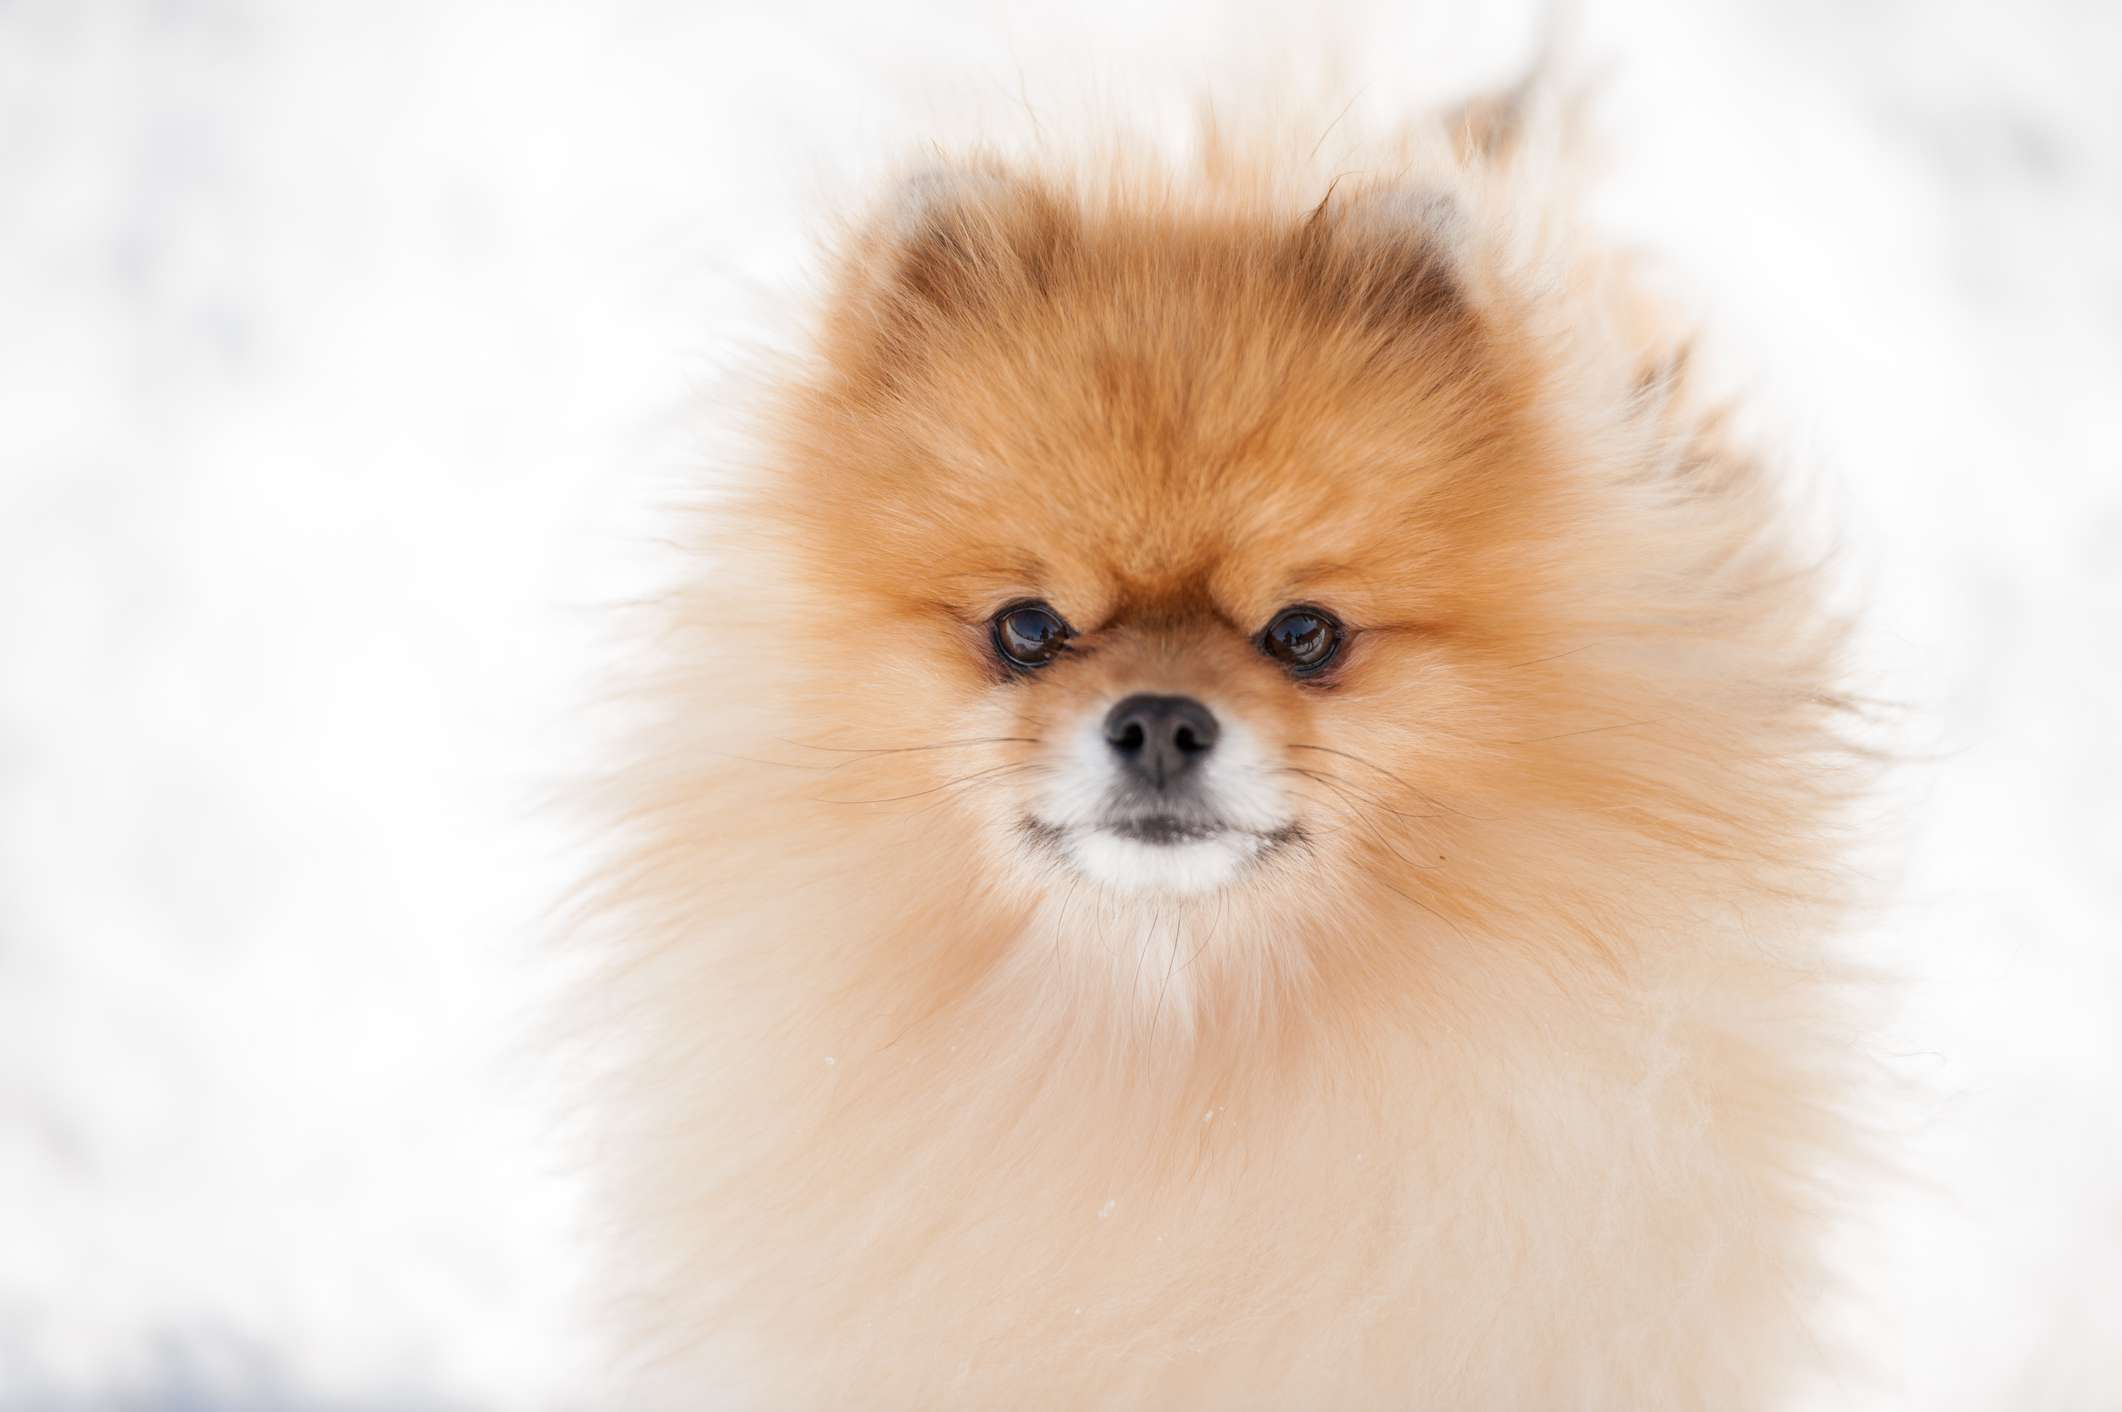 Pomeranian headshot with a blurred snowy background